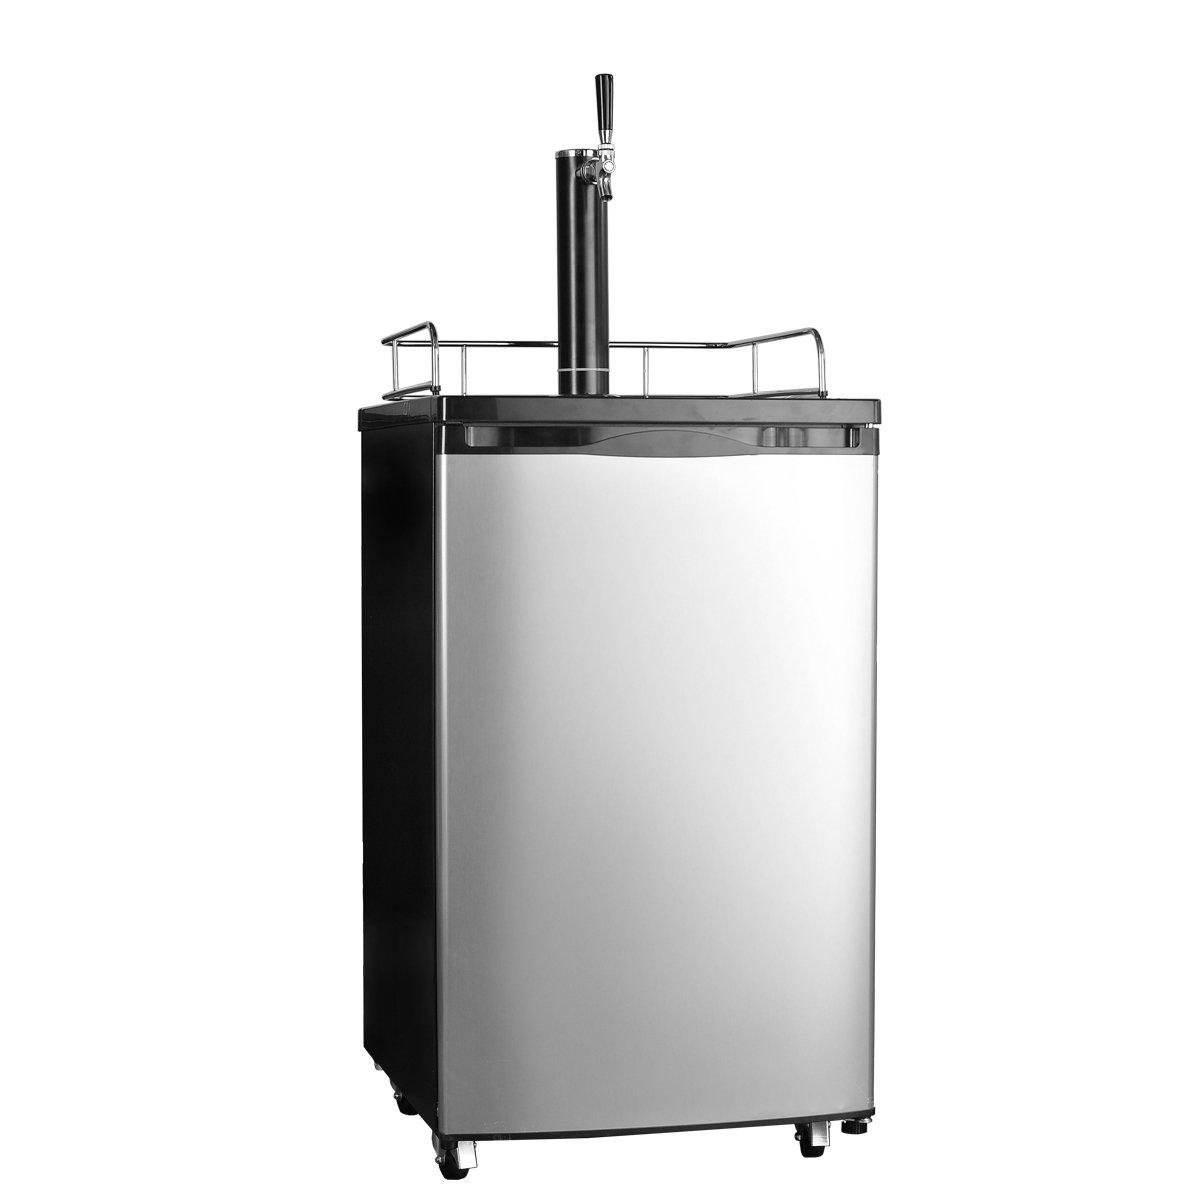 SMETA Freestanding Draft Beer Dispenser with Beer tower Beer keg cooler refrigerator 4.9 cu ft,Stainless steel